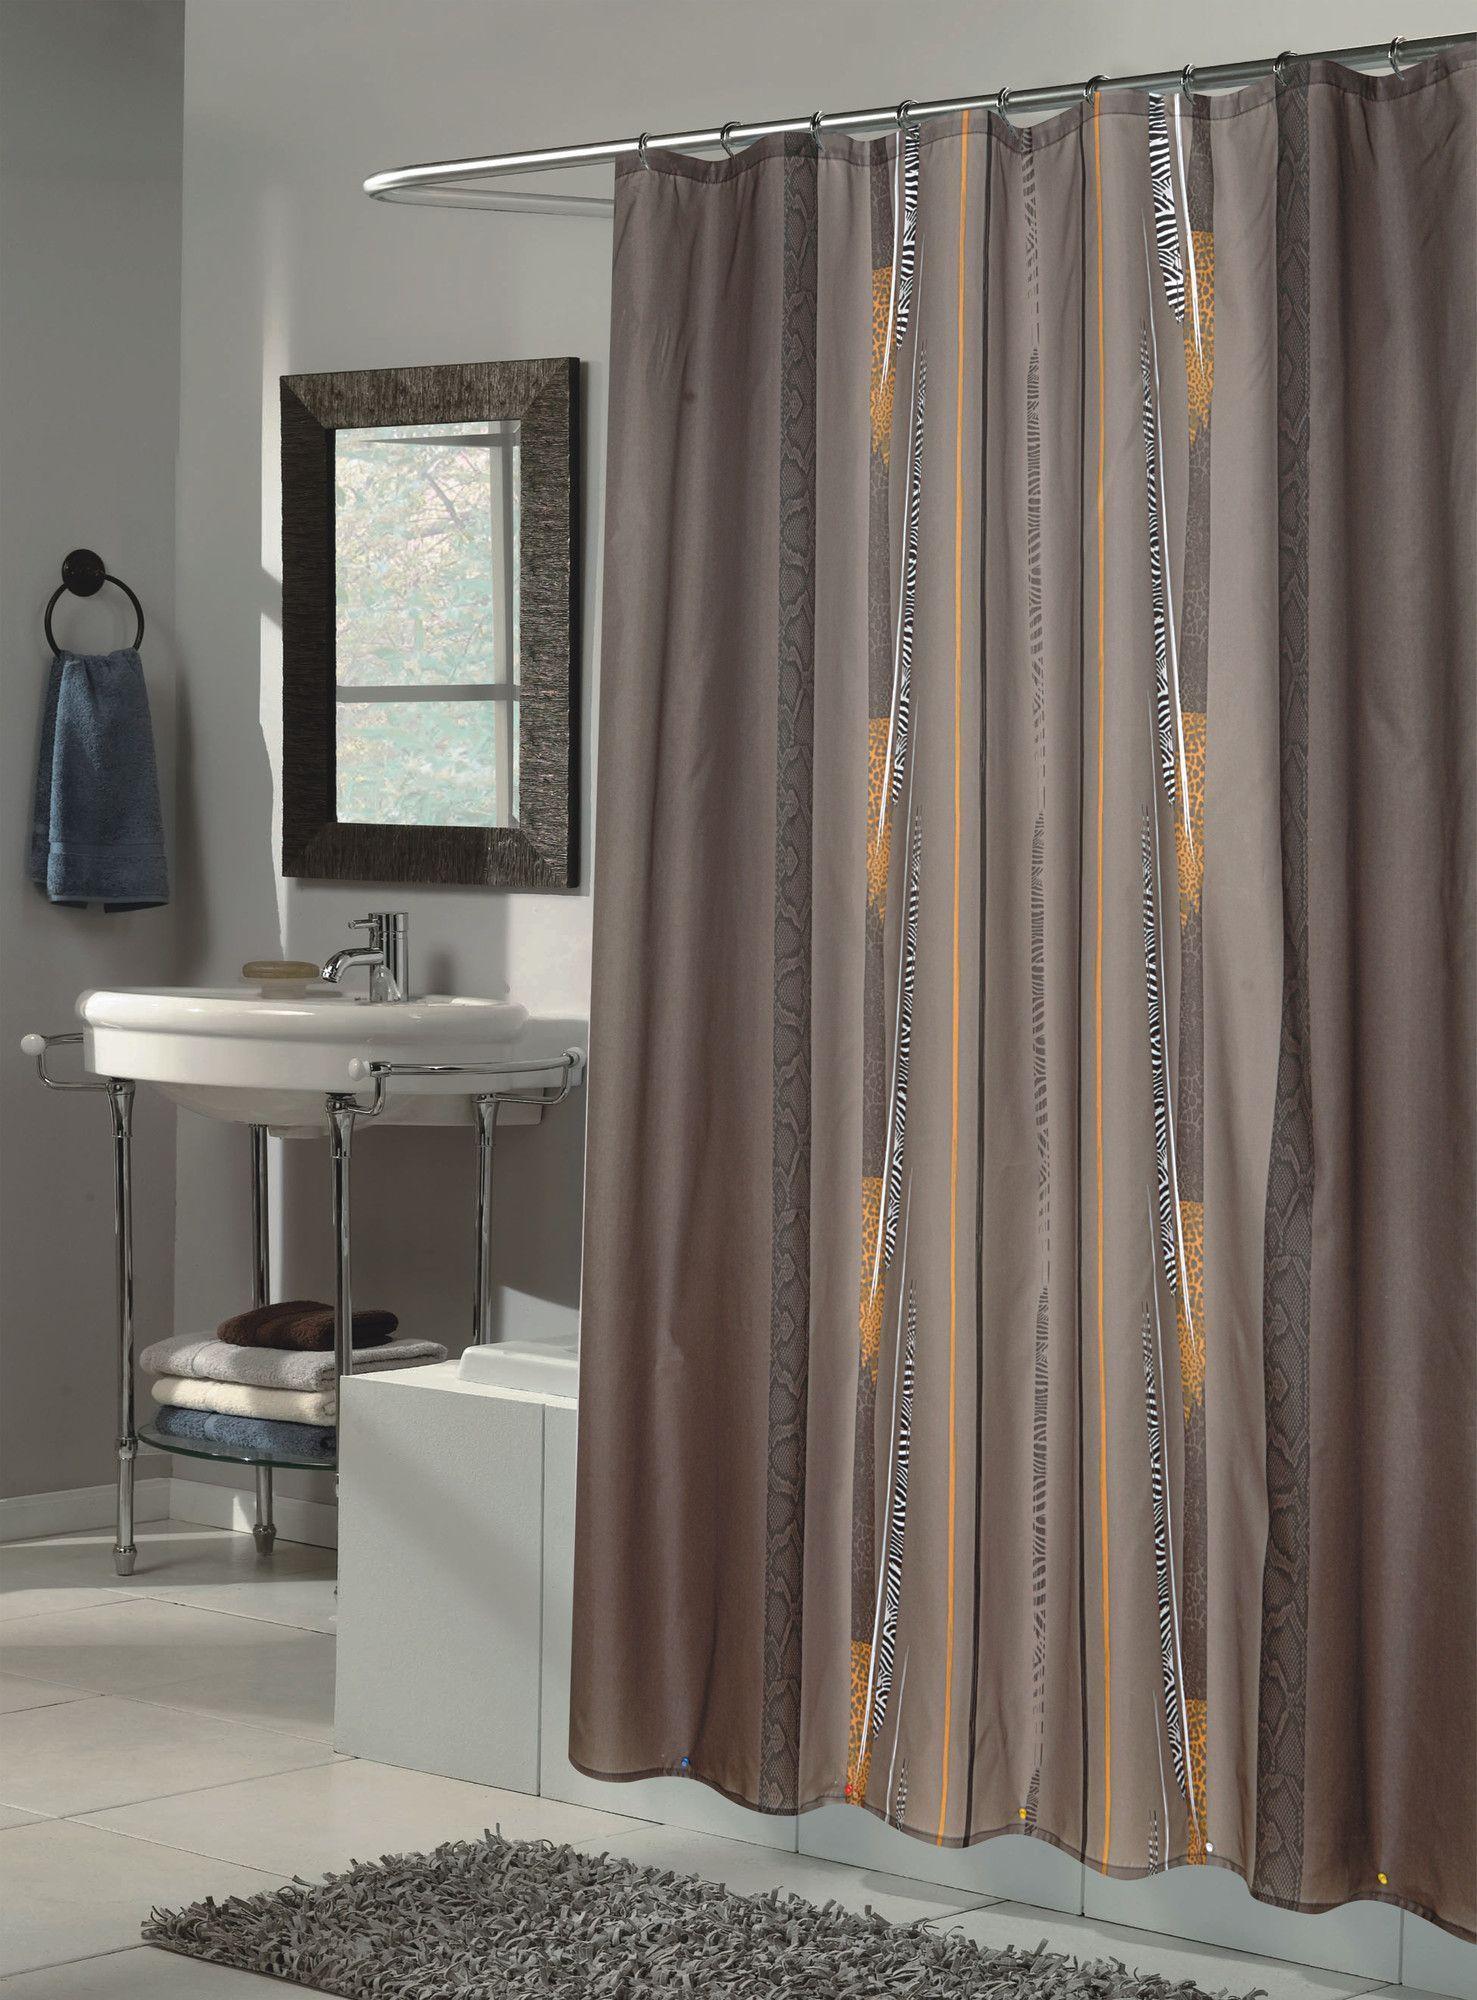 Catherine Shower Curtain Bathroomshowercurtainideas Luxury Extra Long